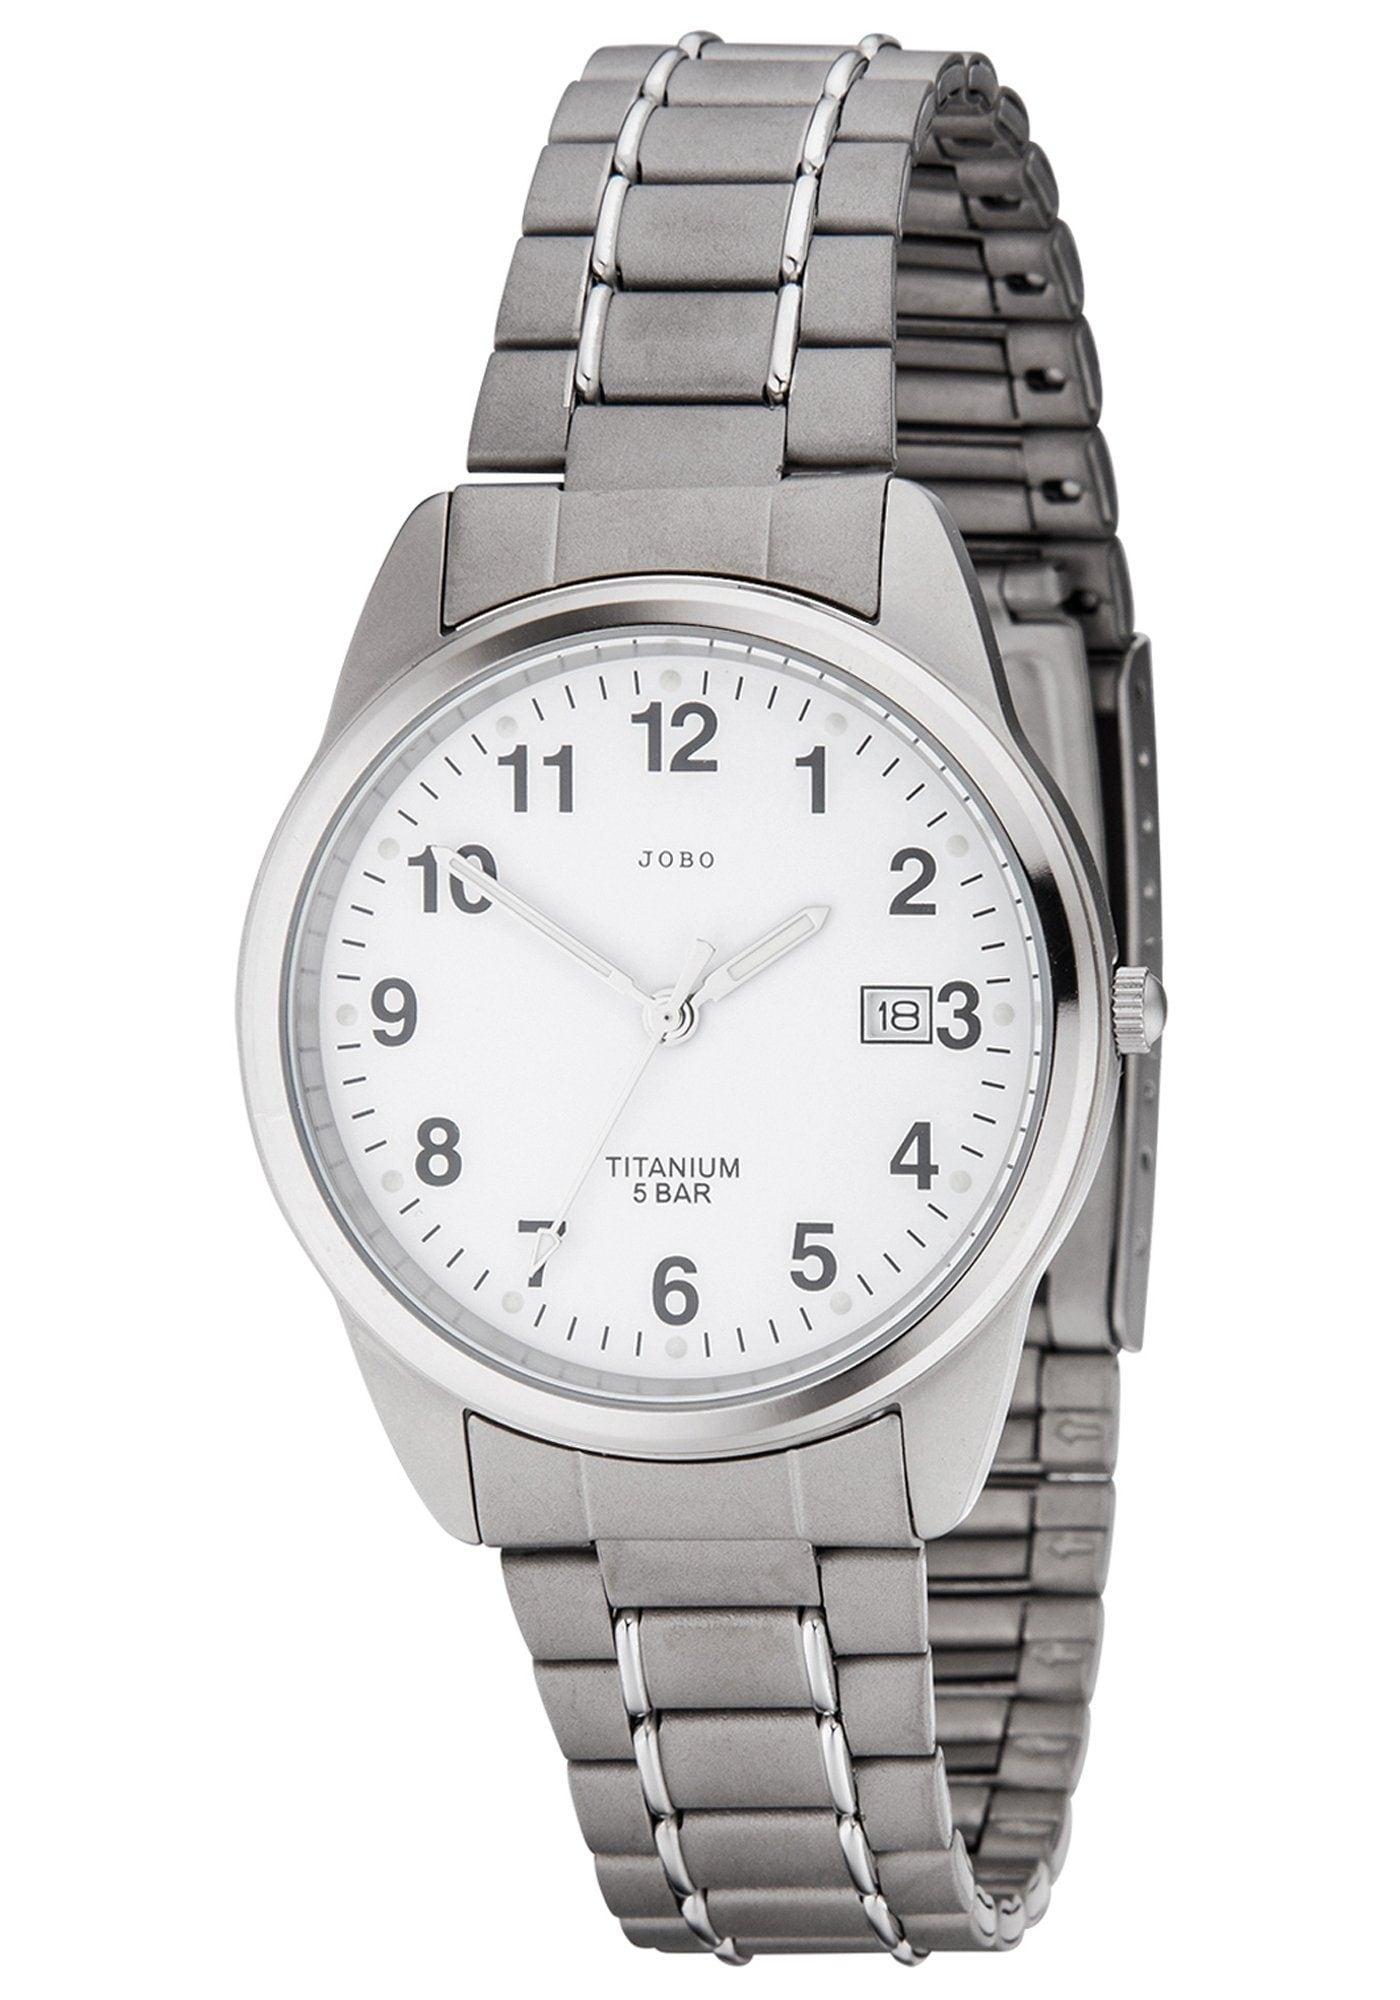 JOBO Titanuhr | Uhren > Titanuhren | Jobo